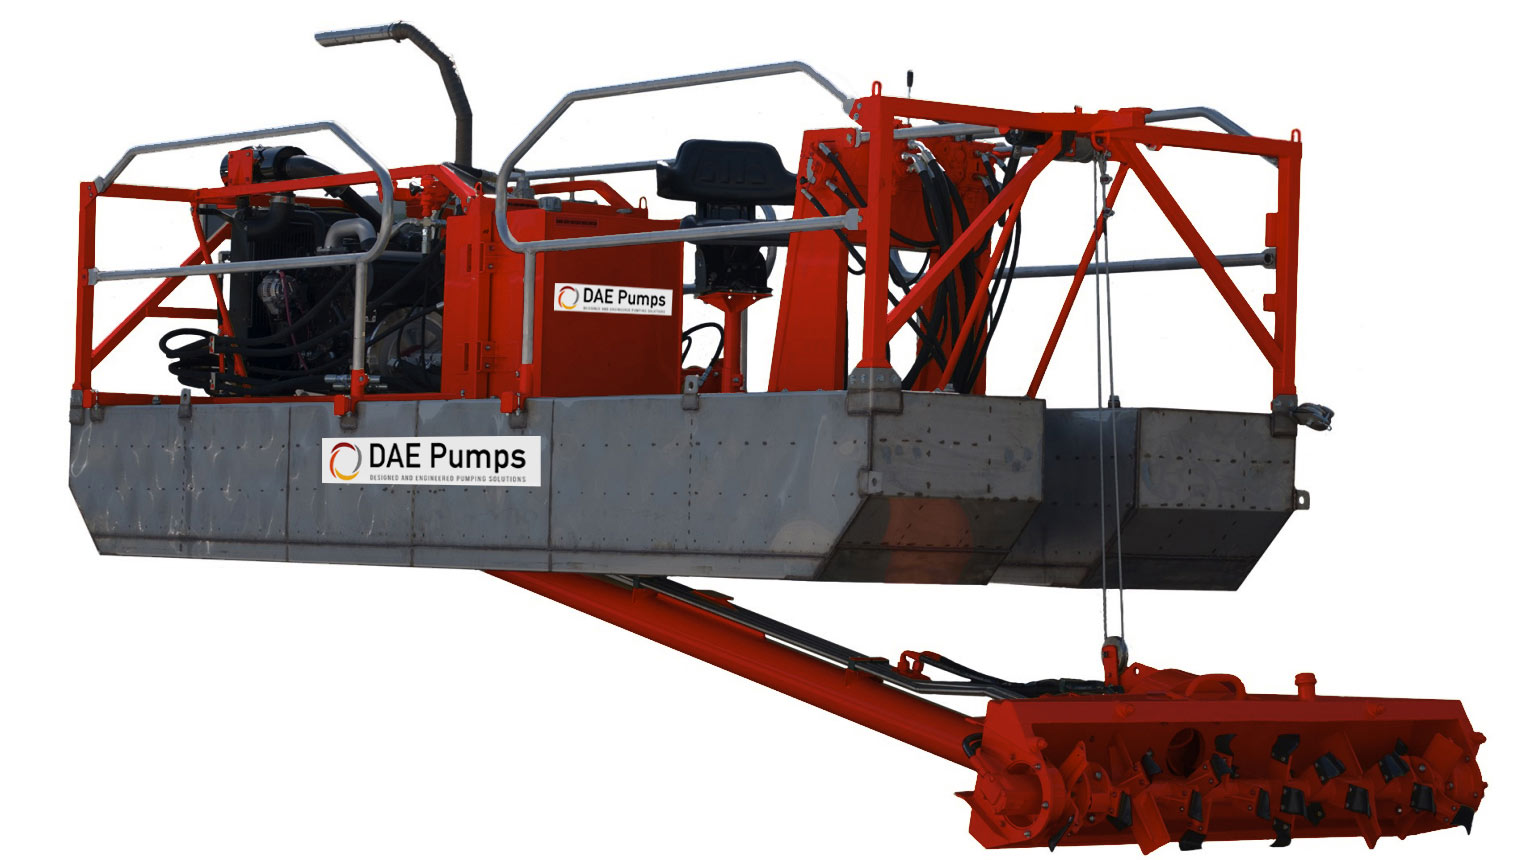 DAE Pumps Starter Pontoon Dredge